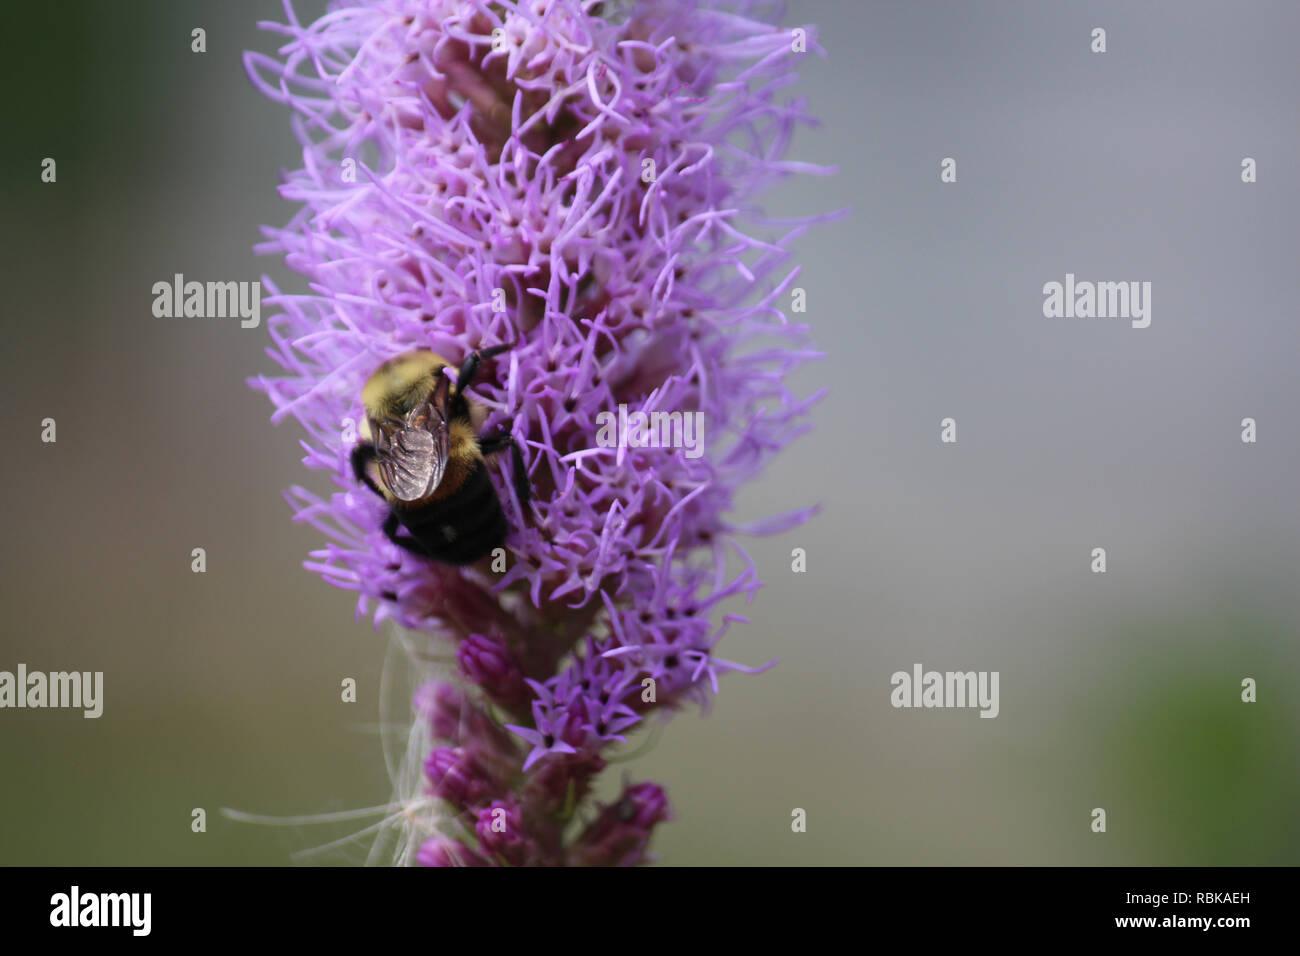 Macro shot of a bumblebee feeding on a purple Liatris flower - Stock Image